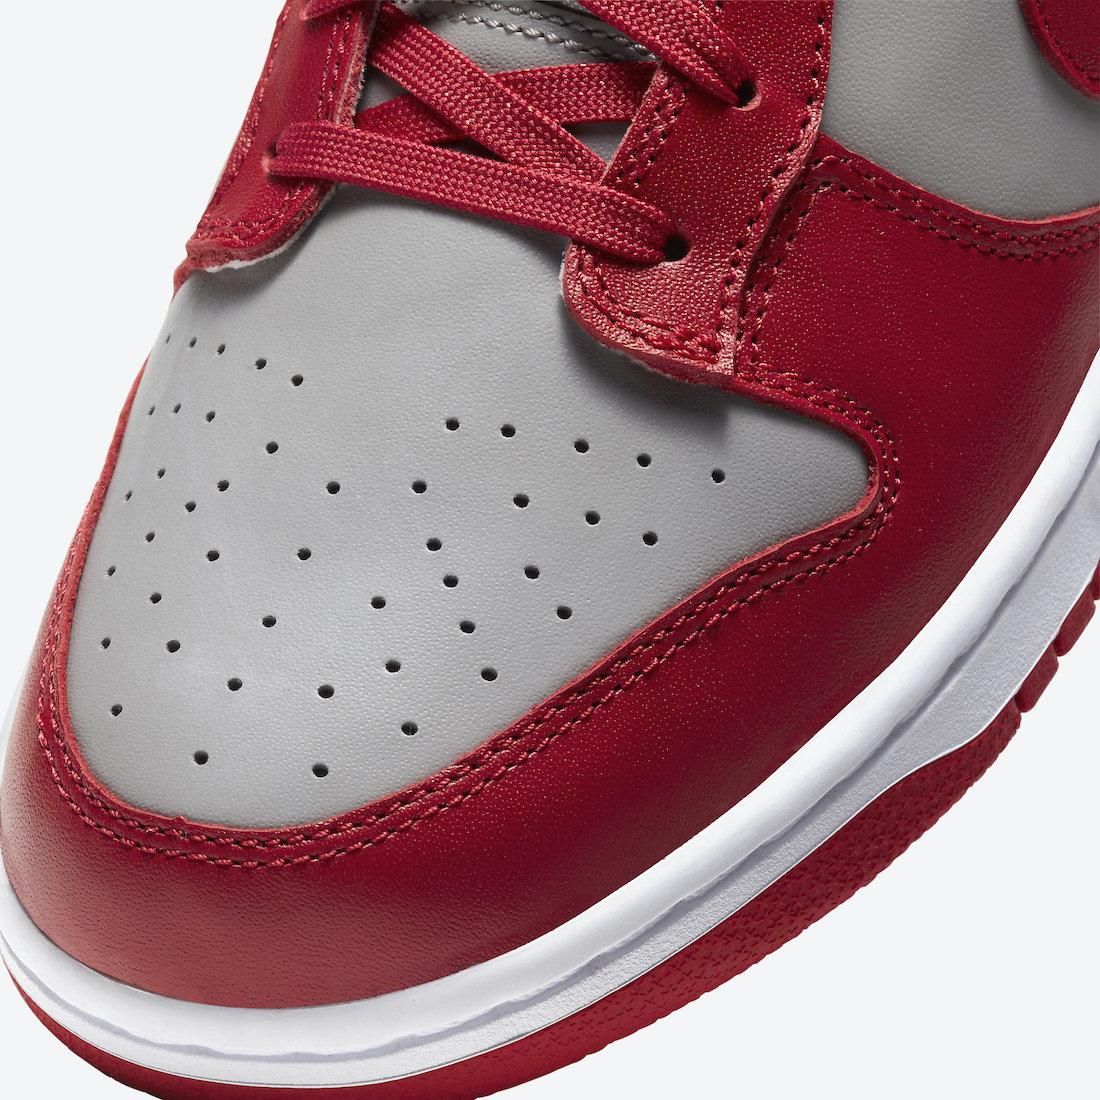 Nike-Dunk-Low-UNLV-DD1391-002-Release-Date-Price-6